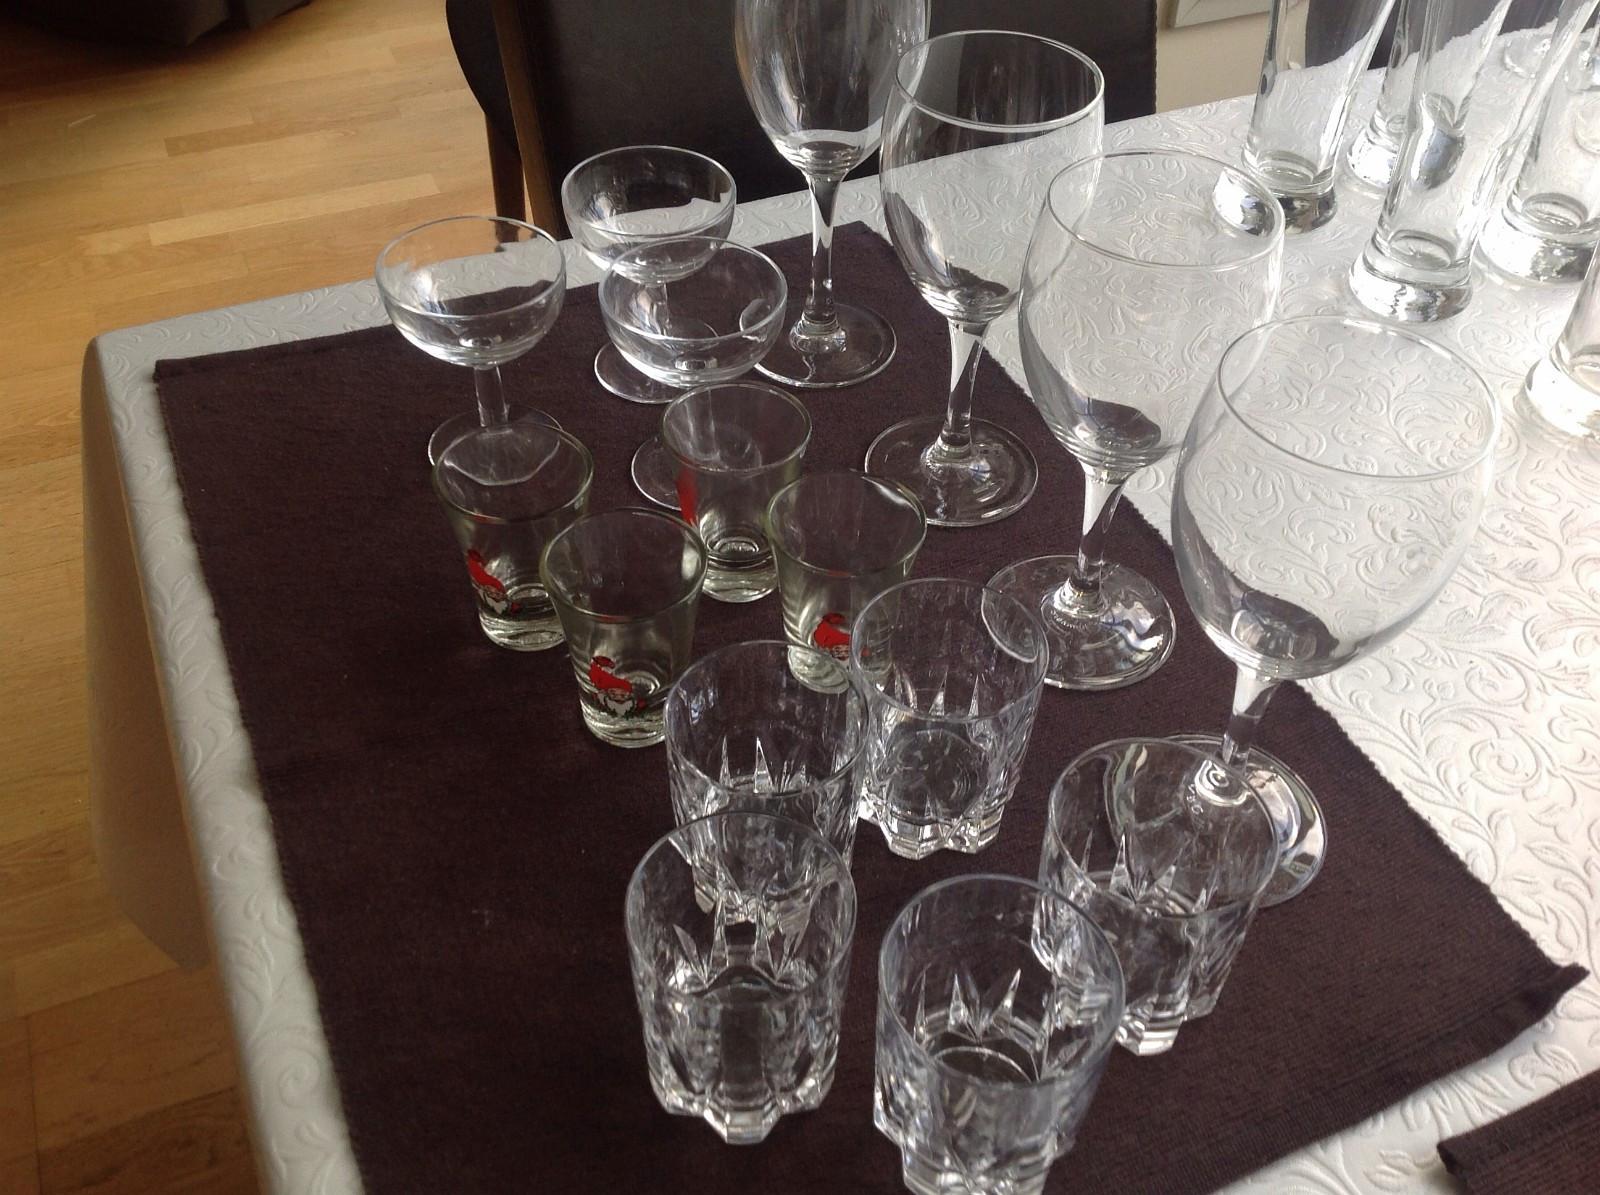 14 glass . - Trondheim  - 14 glass til hybelboerne - Trondheim